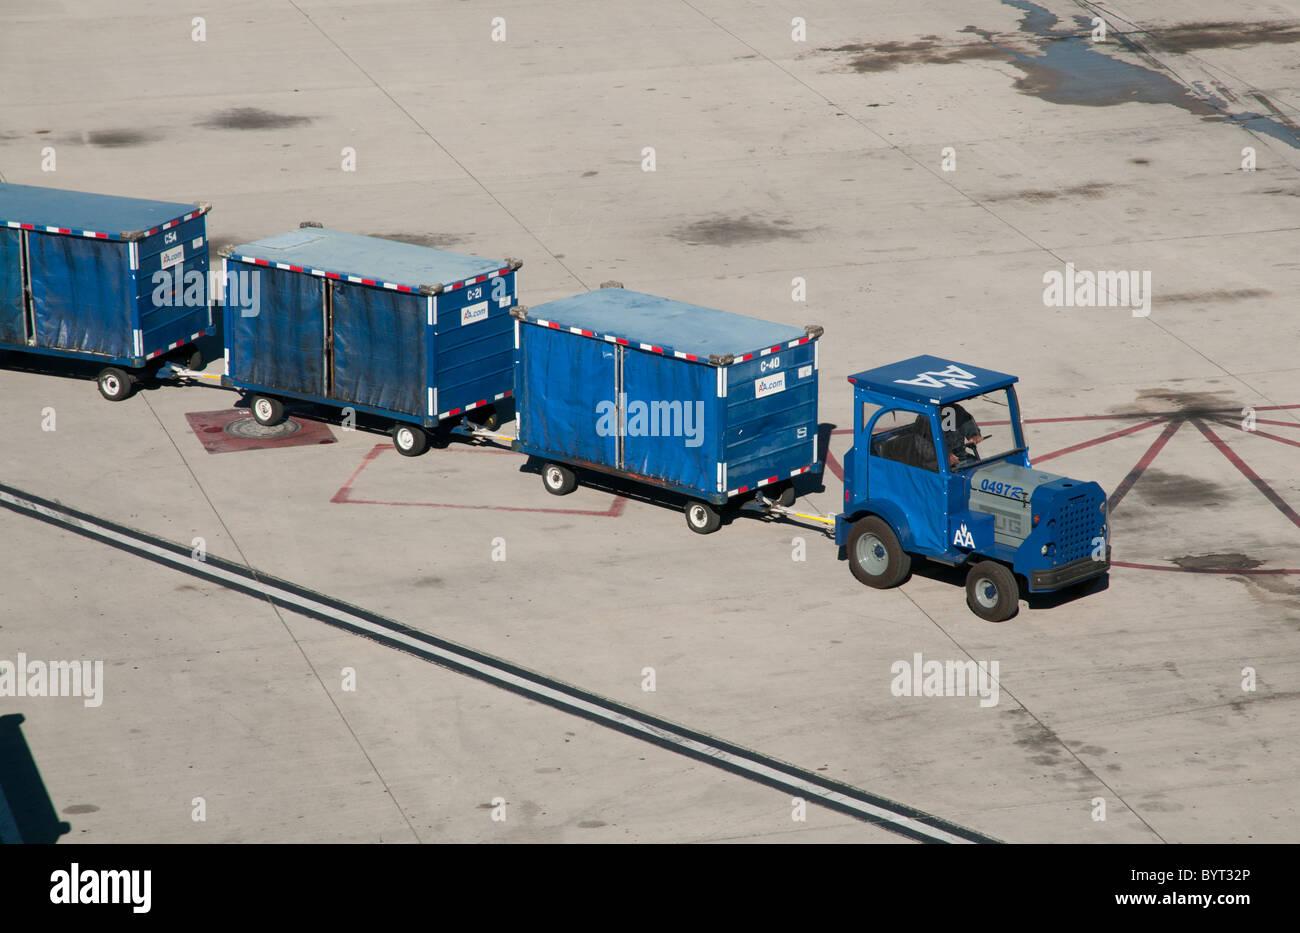 Luggage truck train airside at McCarran International Airport - Stock Image